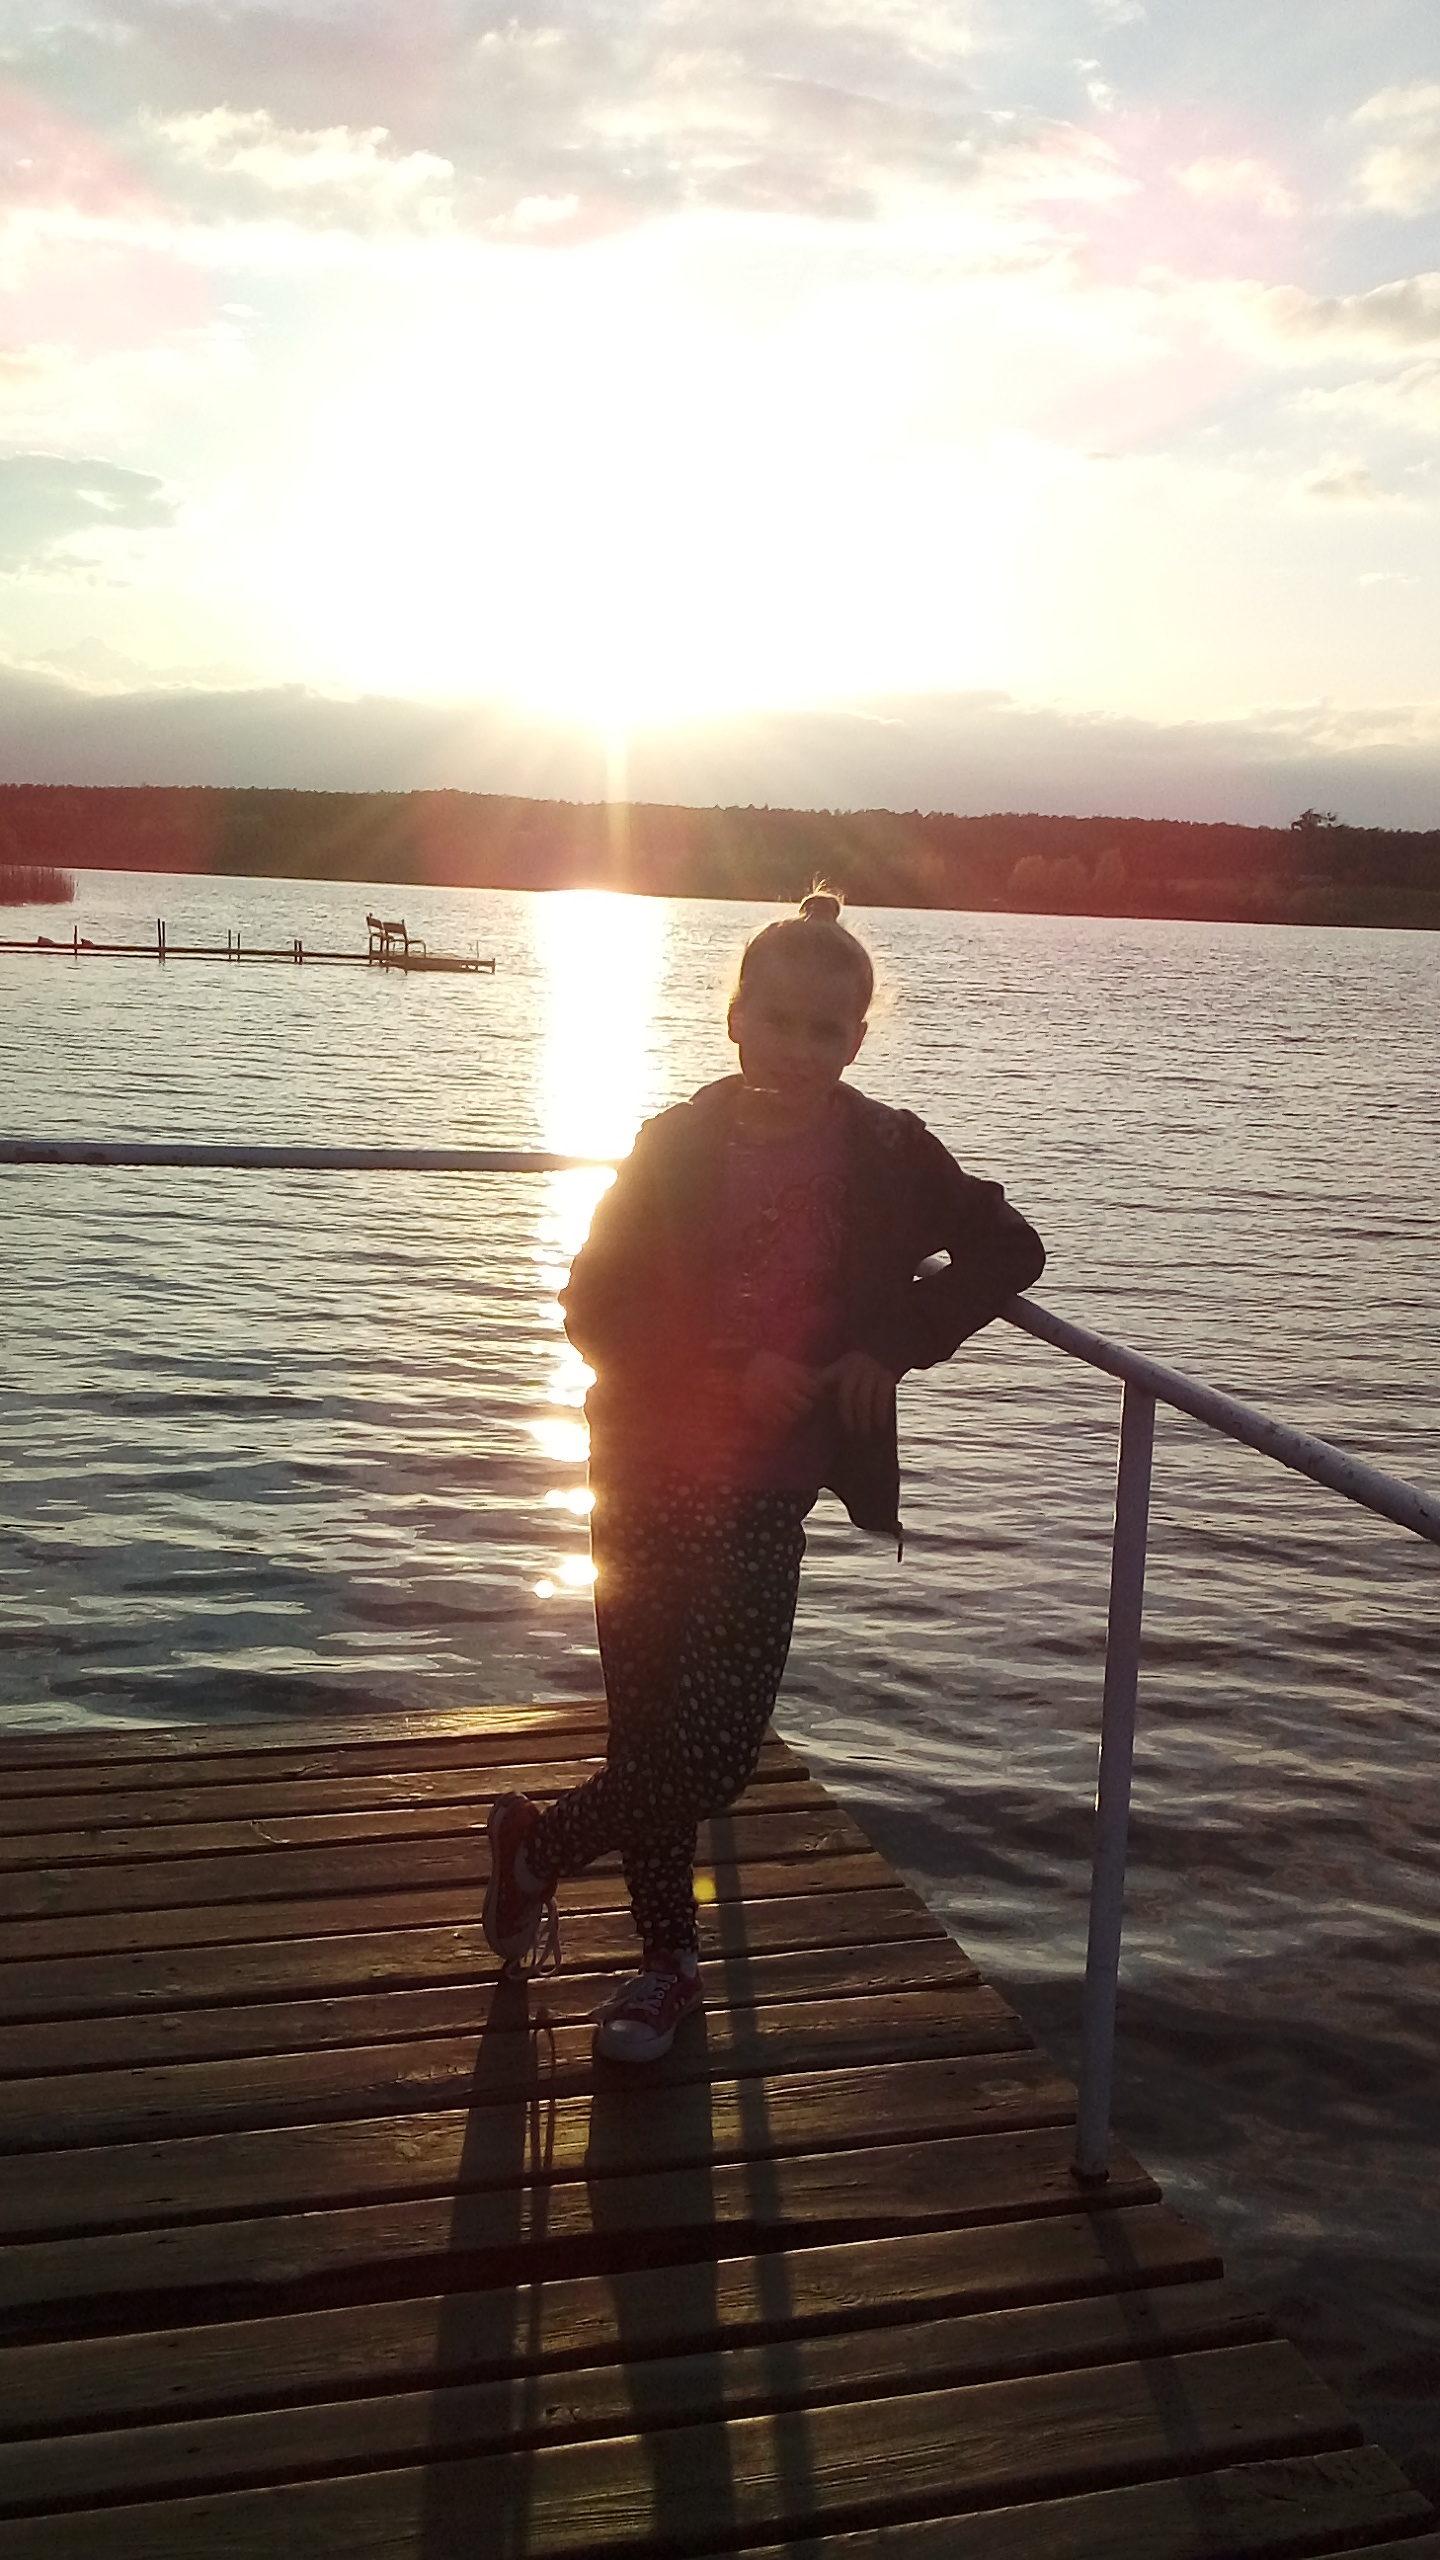 Jezioro Skarlinskie, Barbara Wardowska